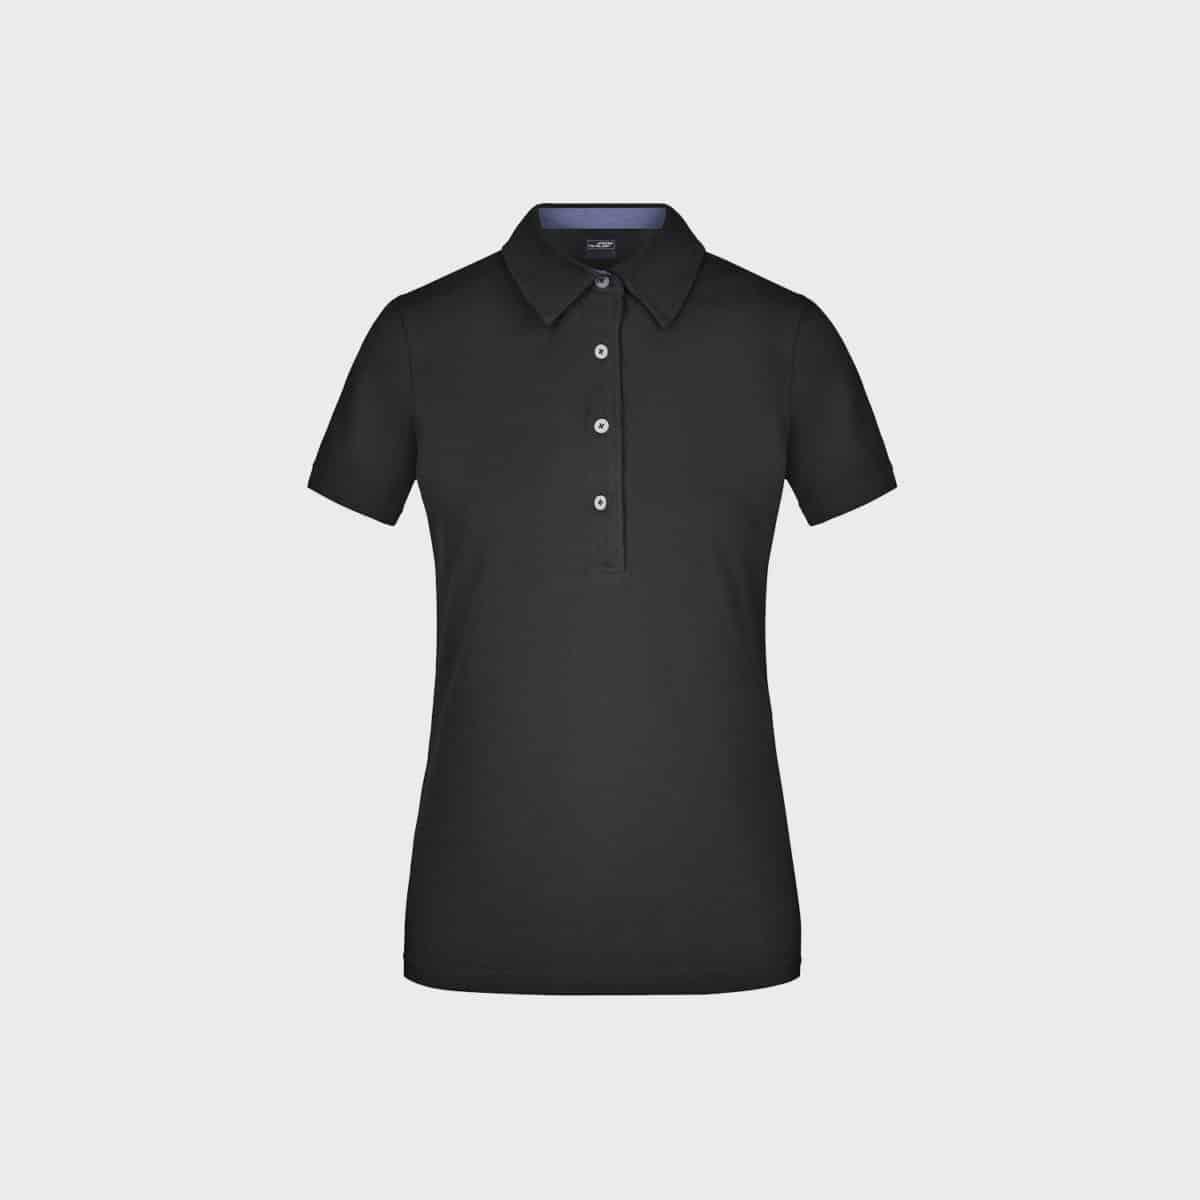 plain-polo-t-shirt-button-down-damen-clack-light-denim-kaufen-besticken_stickmanufaktur